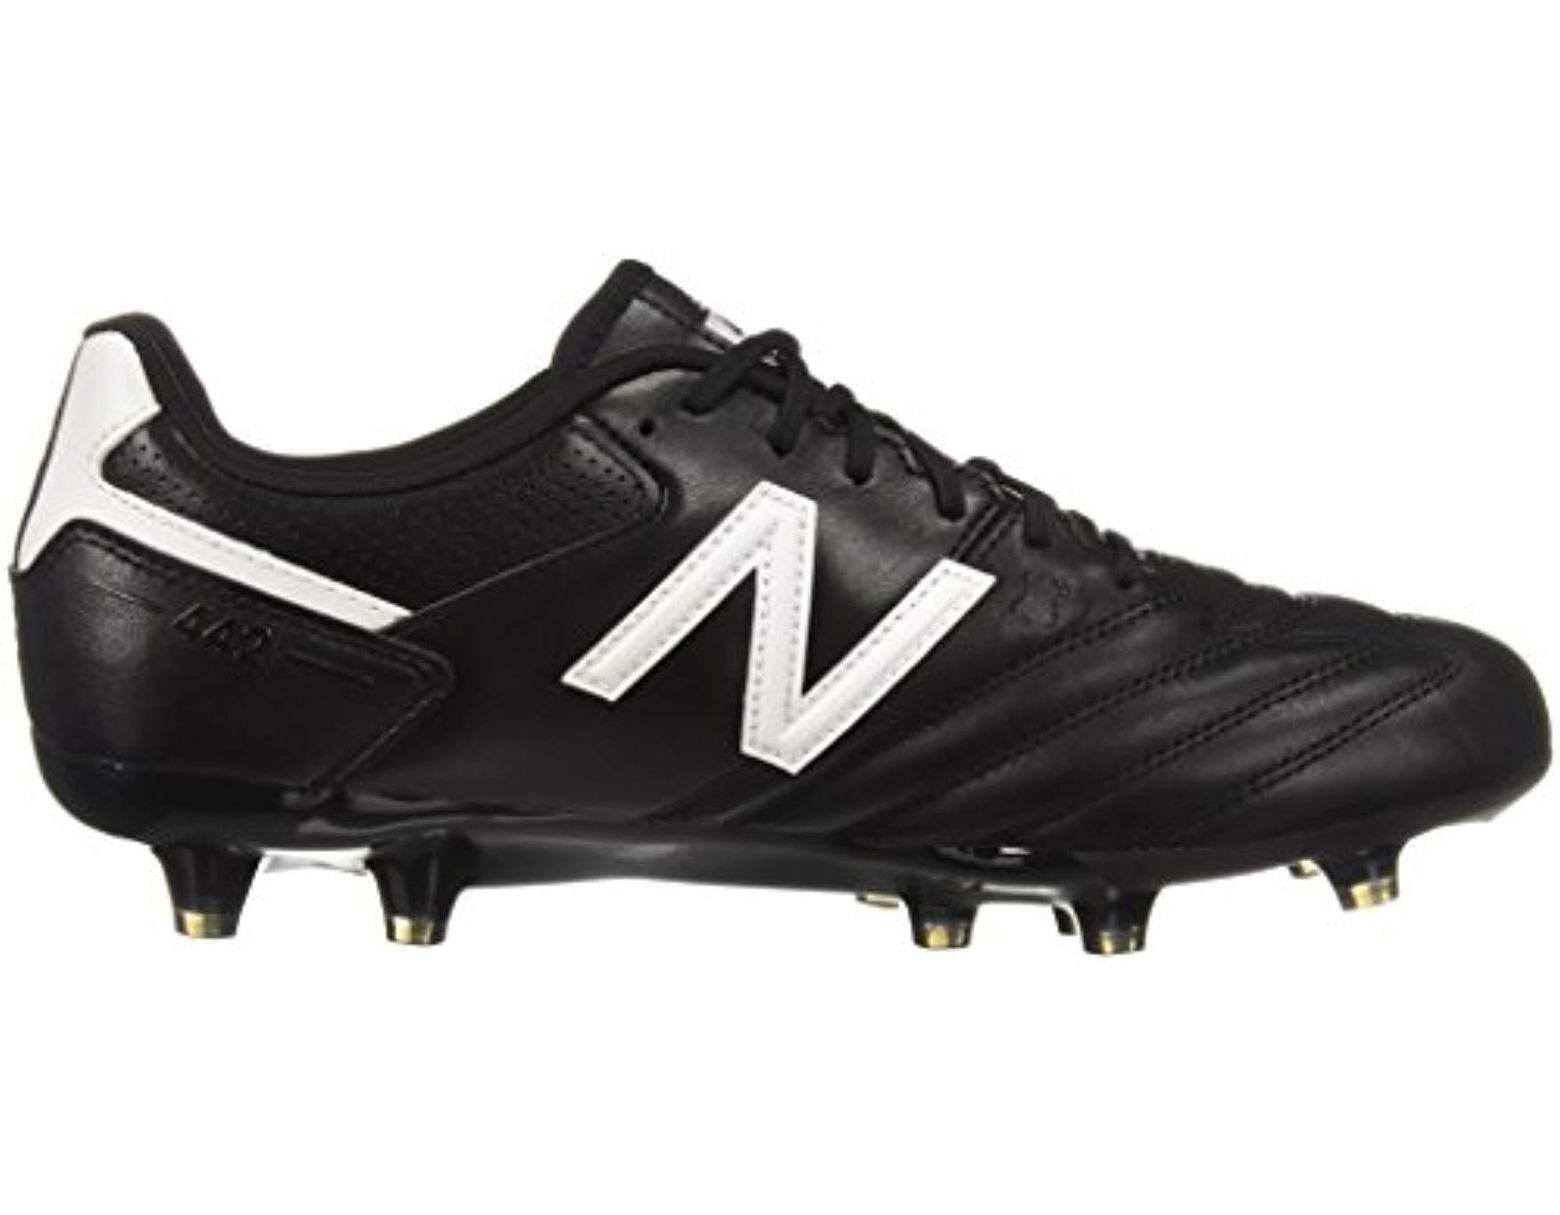 38f203f2aa2 New Balance 442 Team Fg V1 Classic Soccer Shoe in Black for Men - Lyst